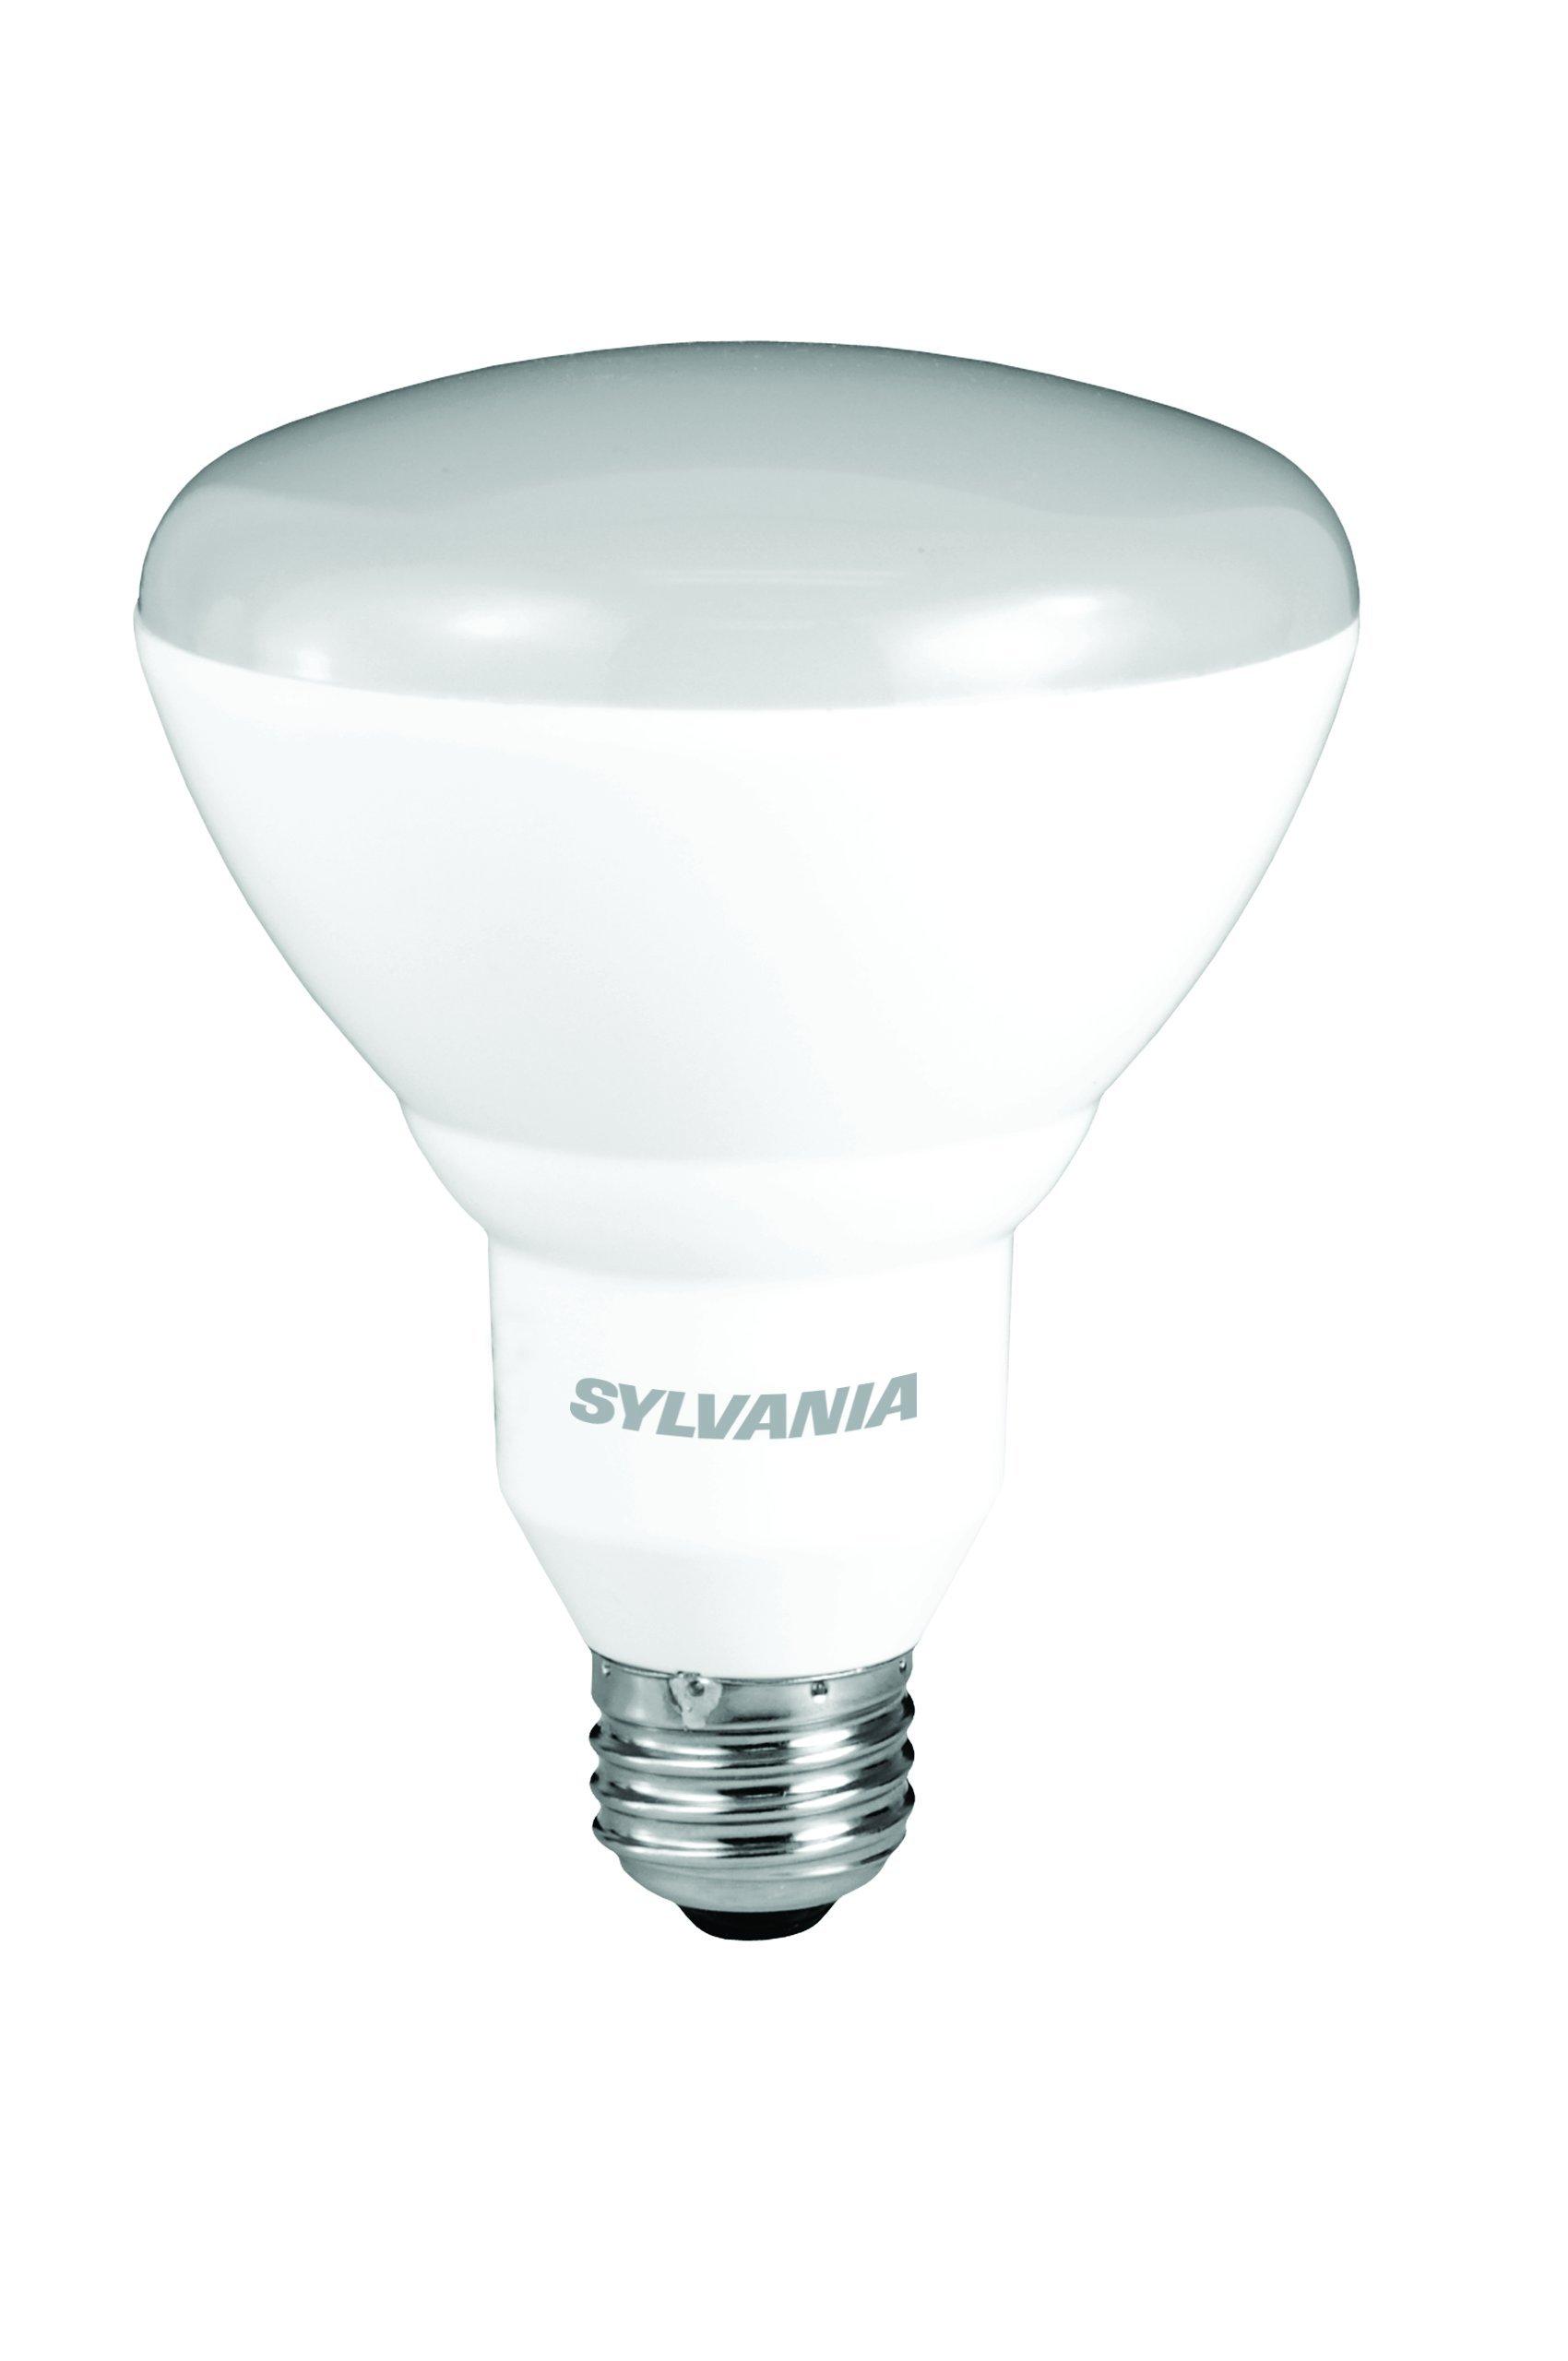 Sylvania 73775 - LED9BR30/DIM/827/G2 BR30 Flood LED Light Bulb